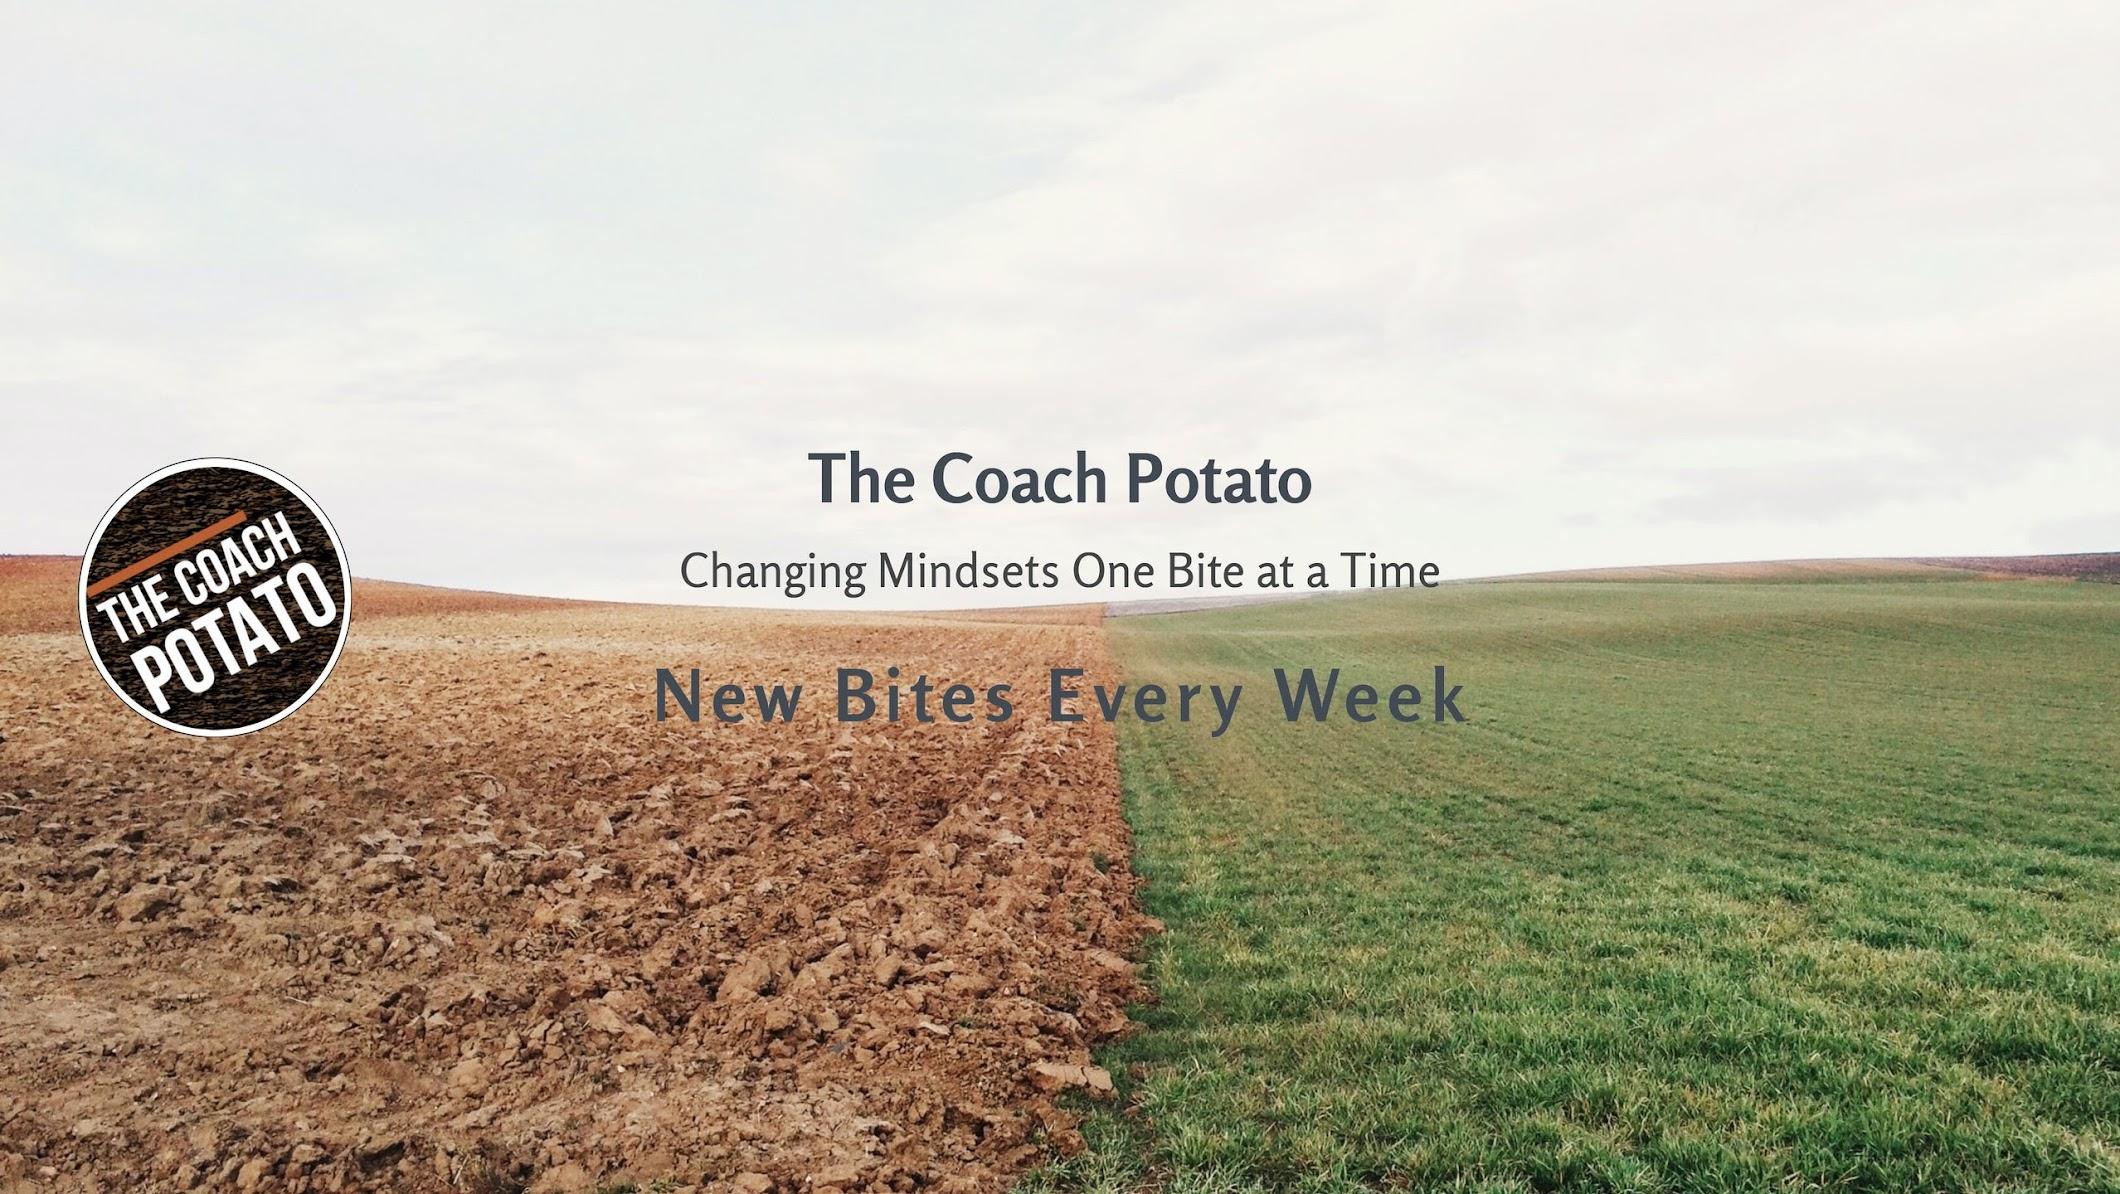 The Coach Potato